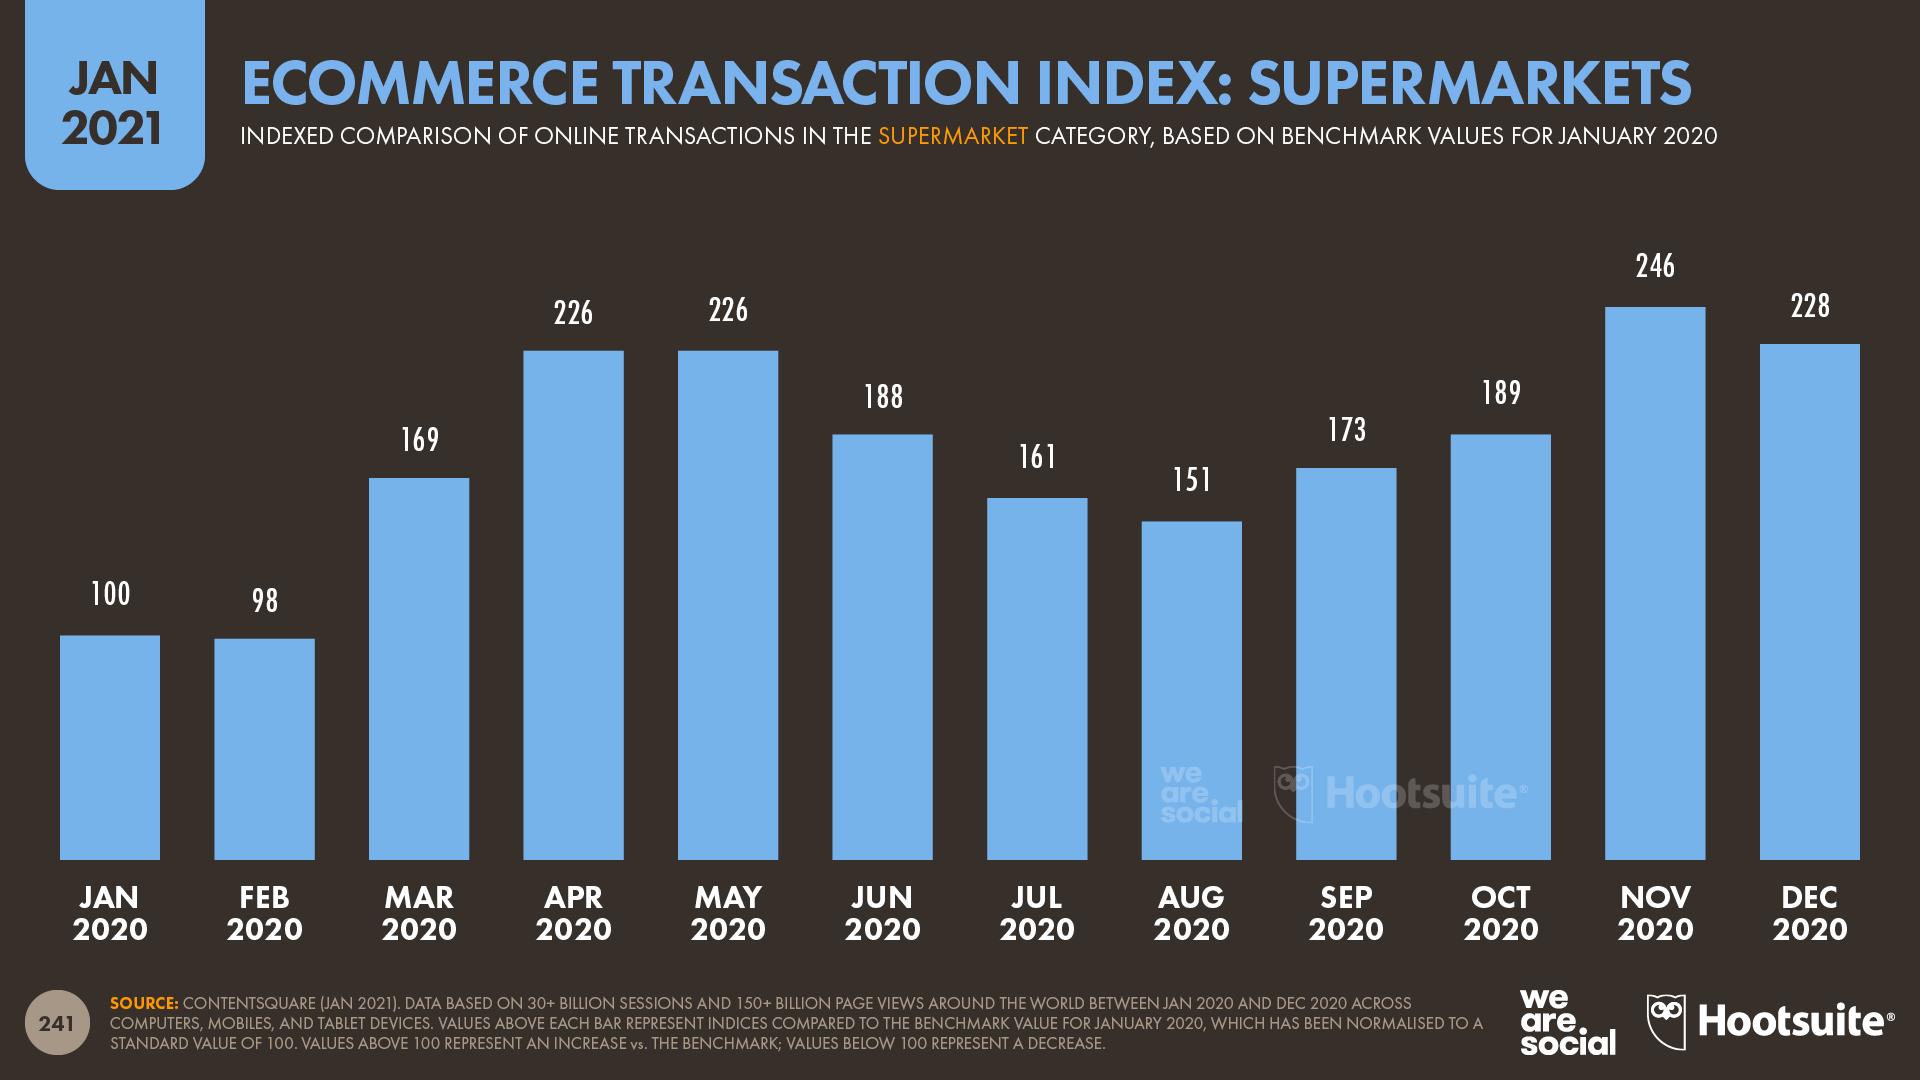 Ecommerce Transaction Index for Supermarkets January 2021 DataReportal